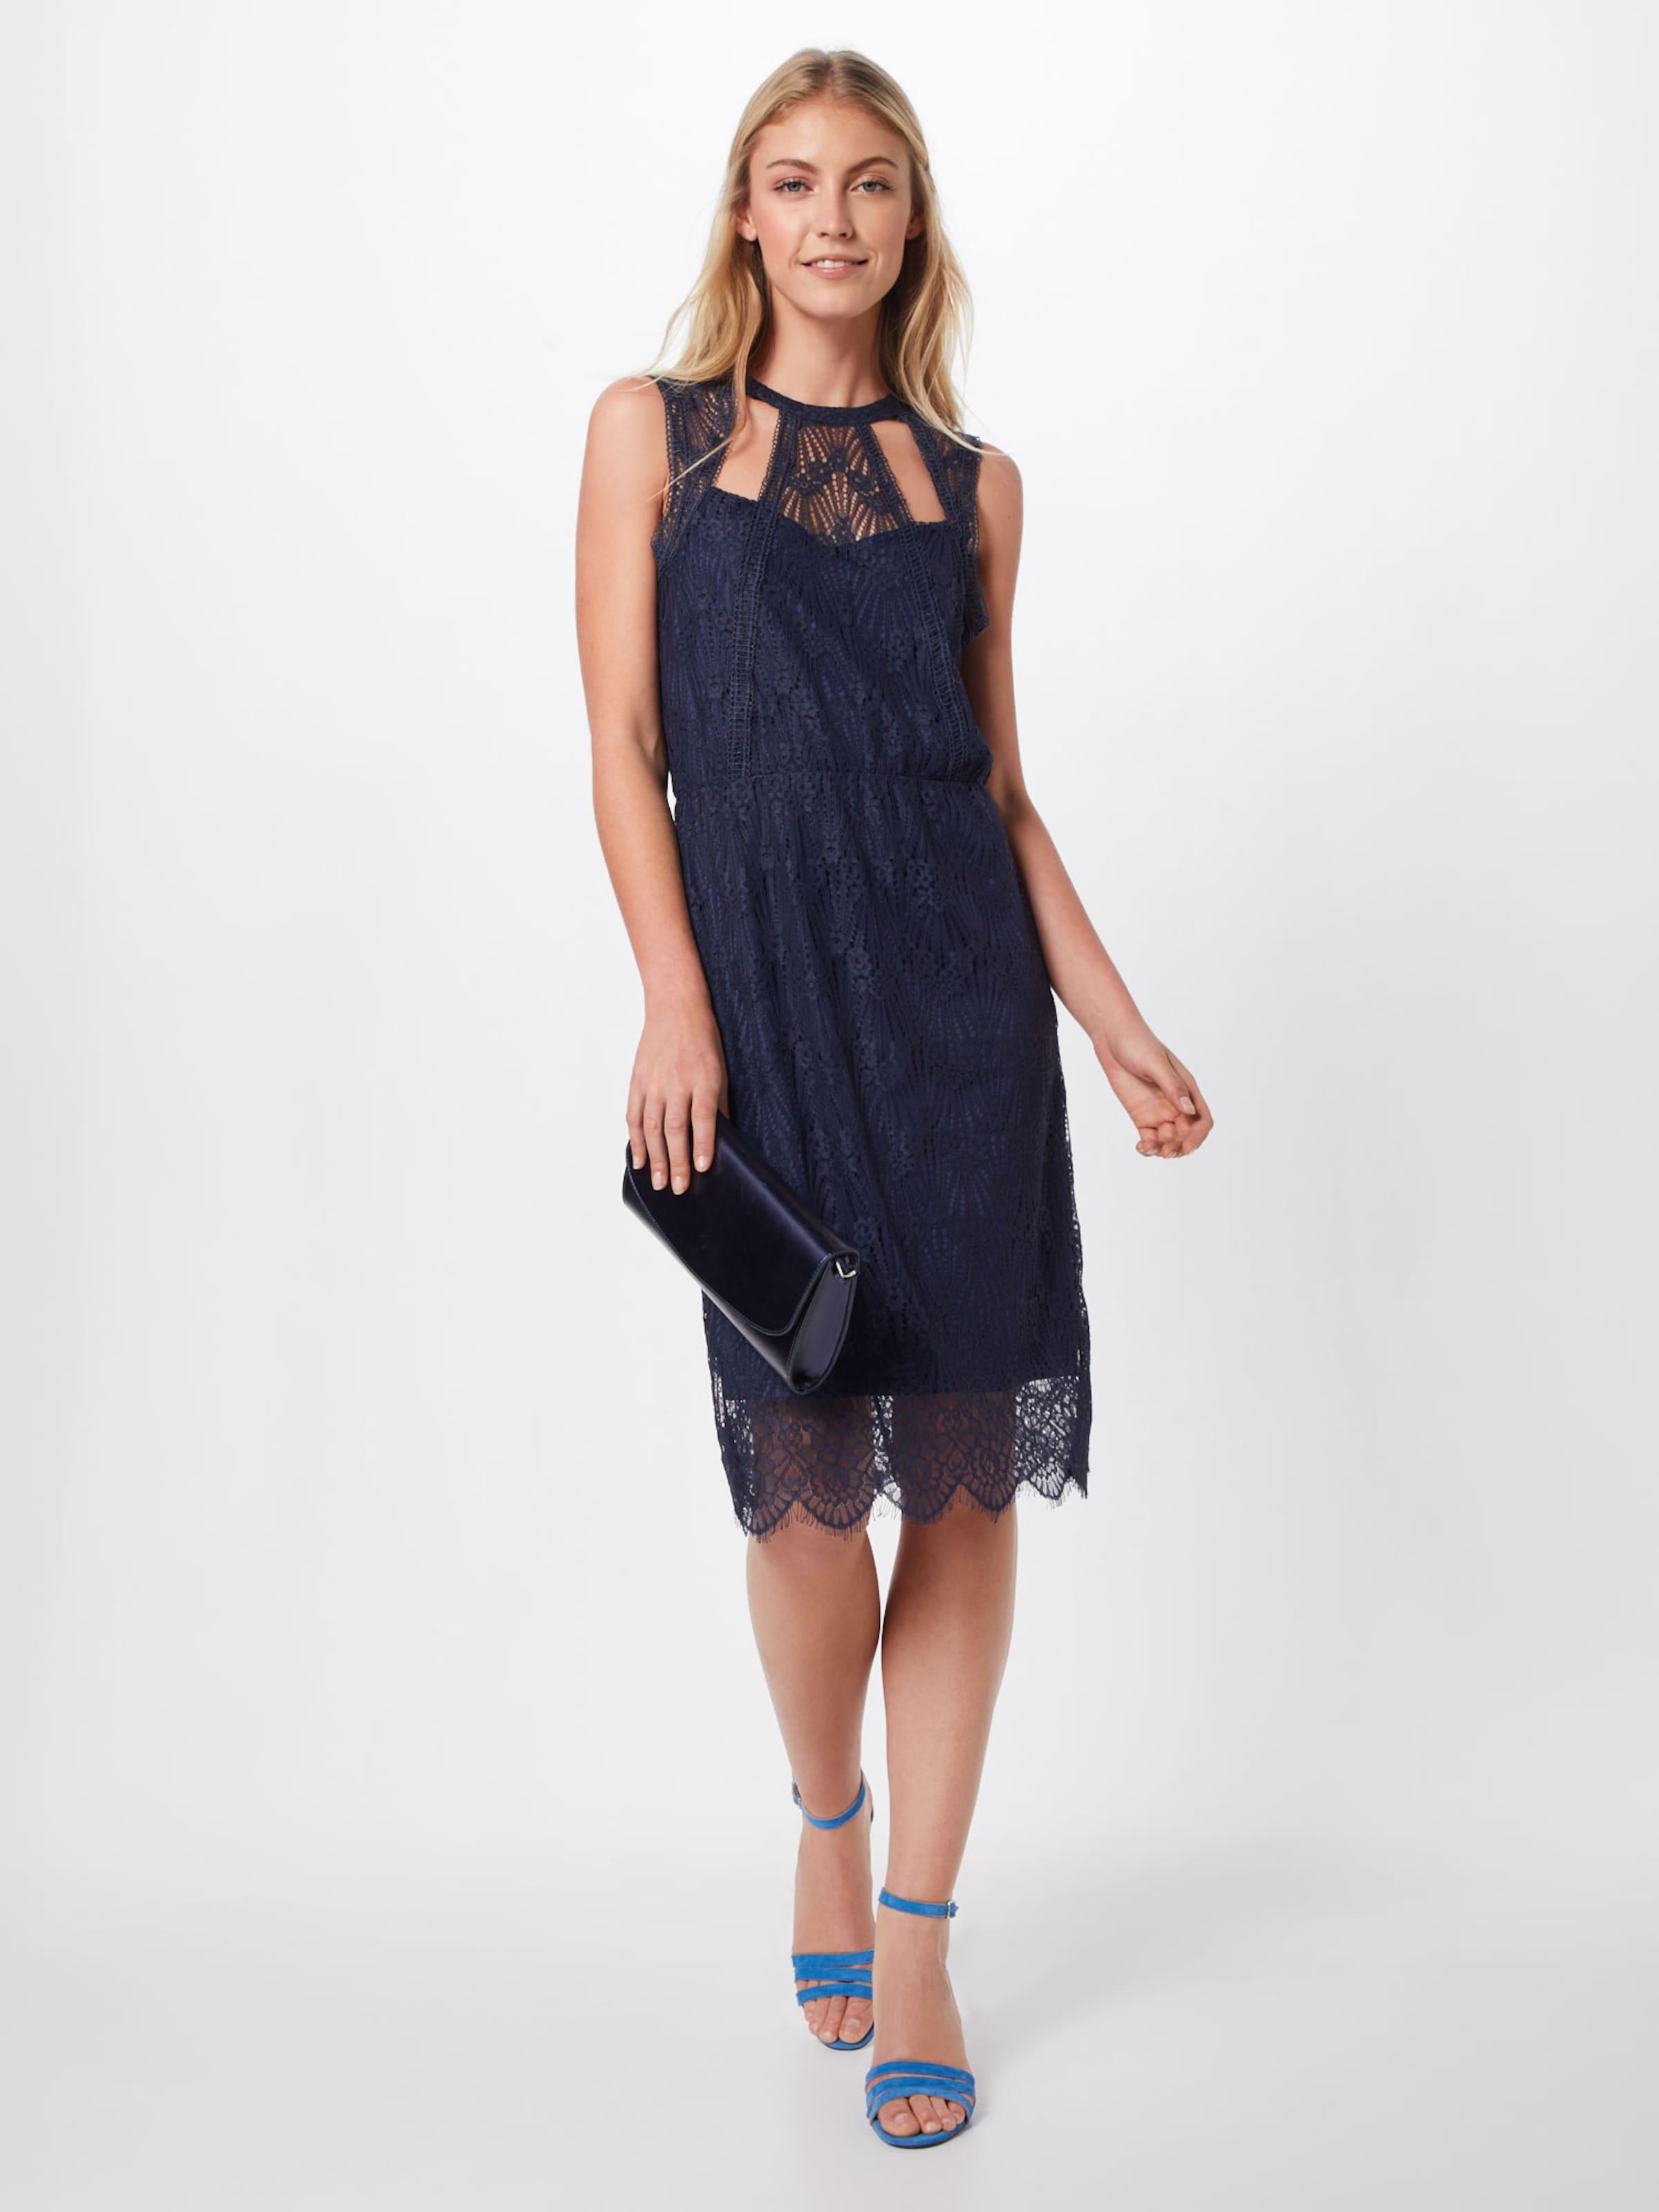 Bleu 'vicalora' Robe De Vila Cocktail Marine En ymN0wPn8vO